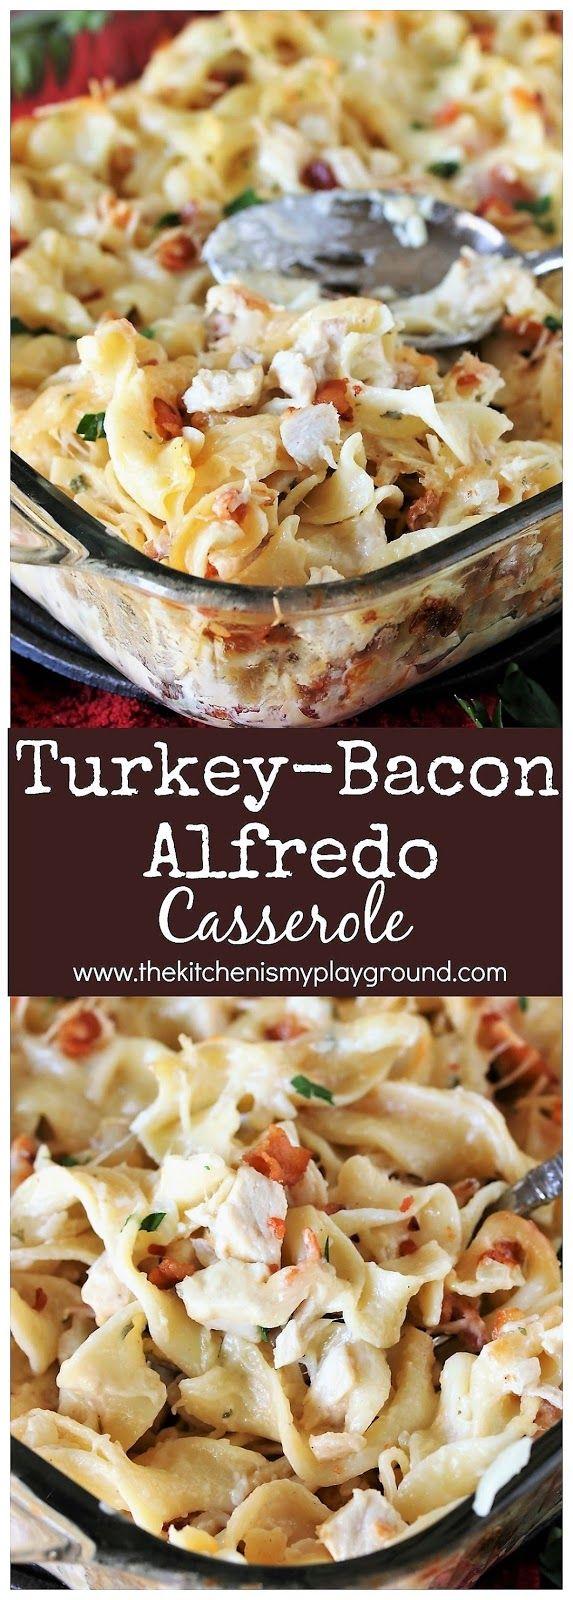 Turkey-Bacon Alfredo Casserole pin image